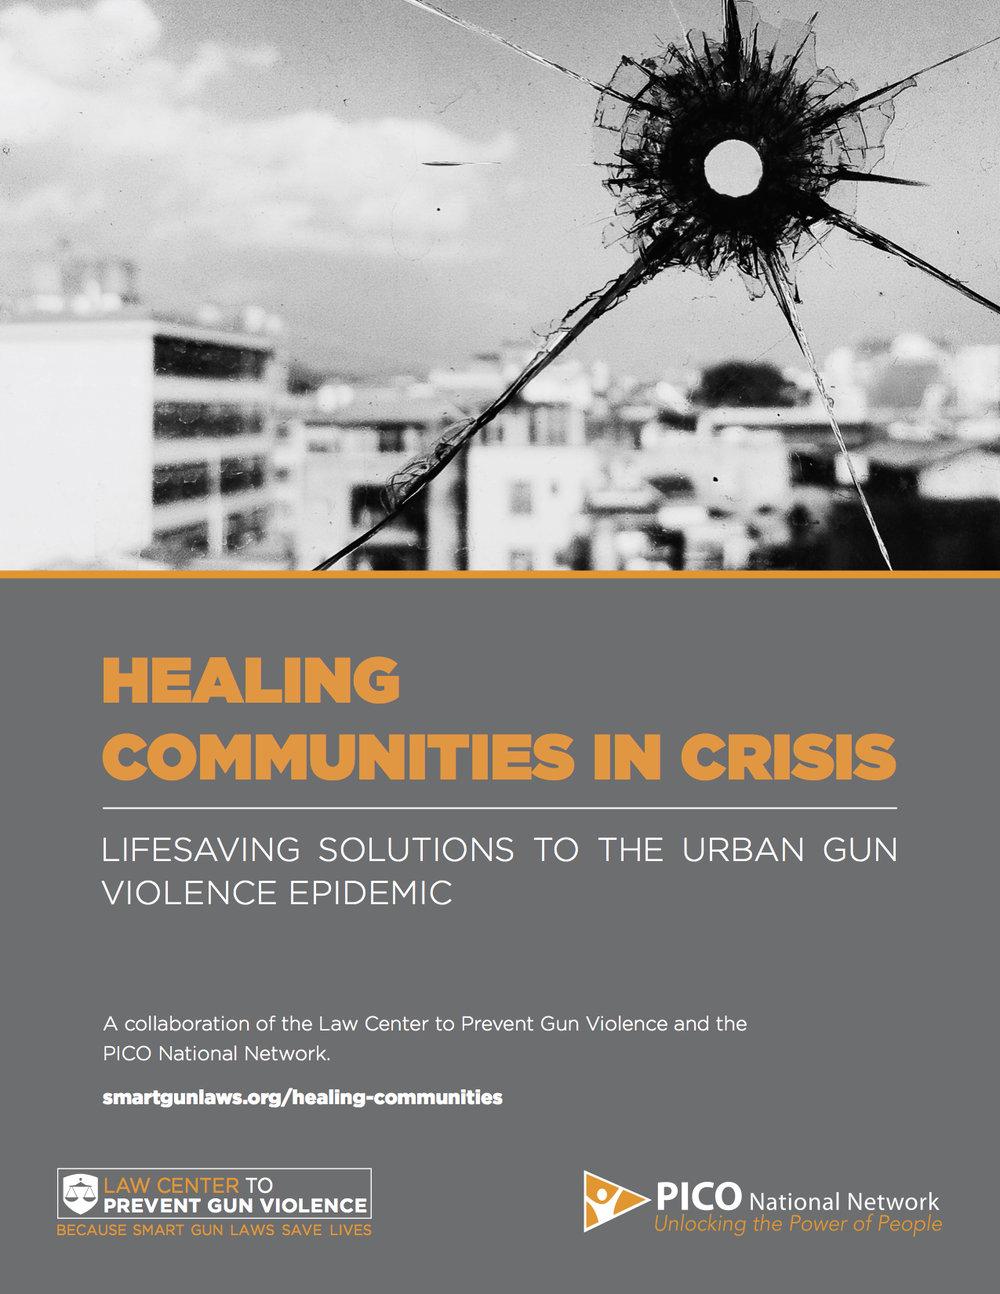 Healing-Communities-in-Crisis.jpg